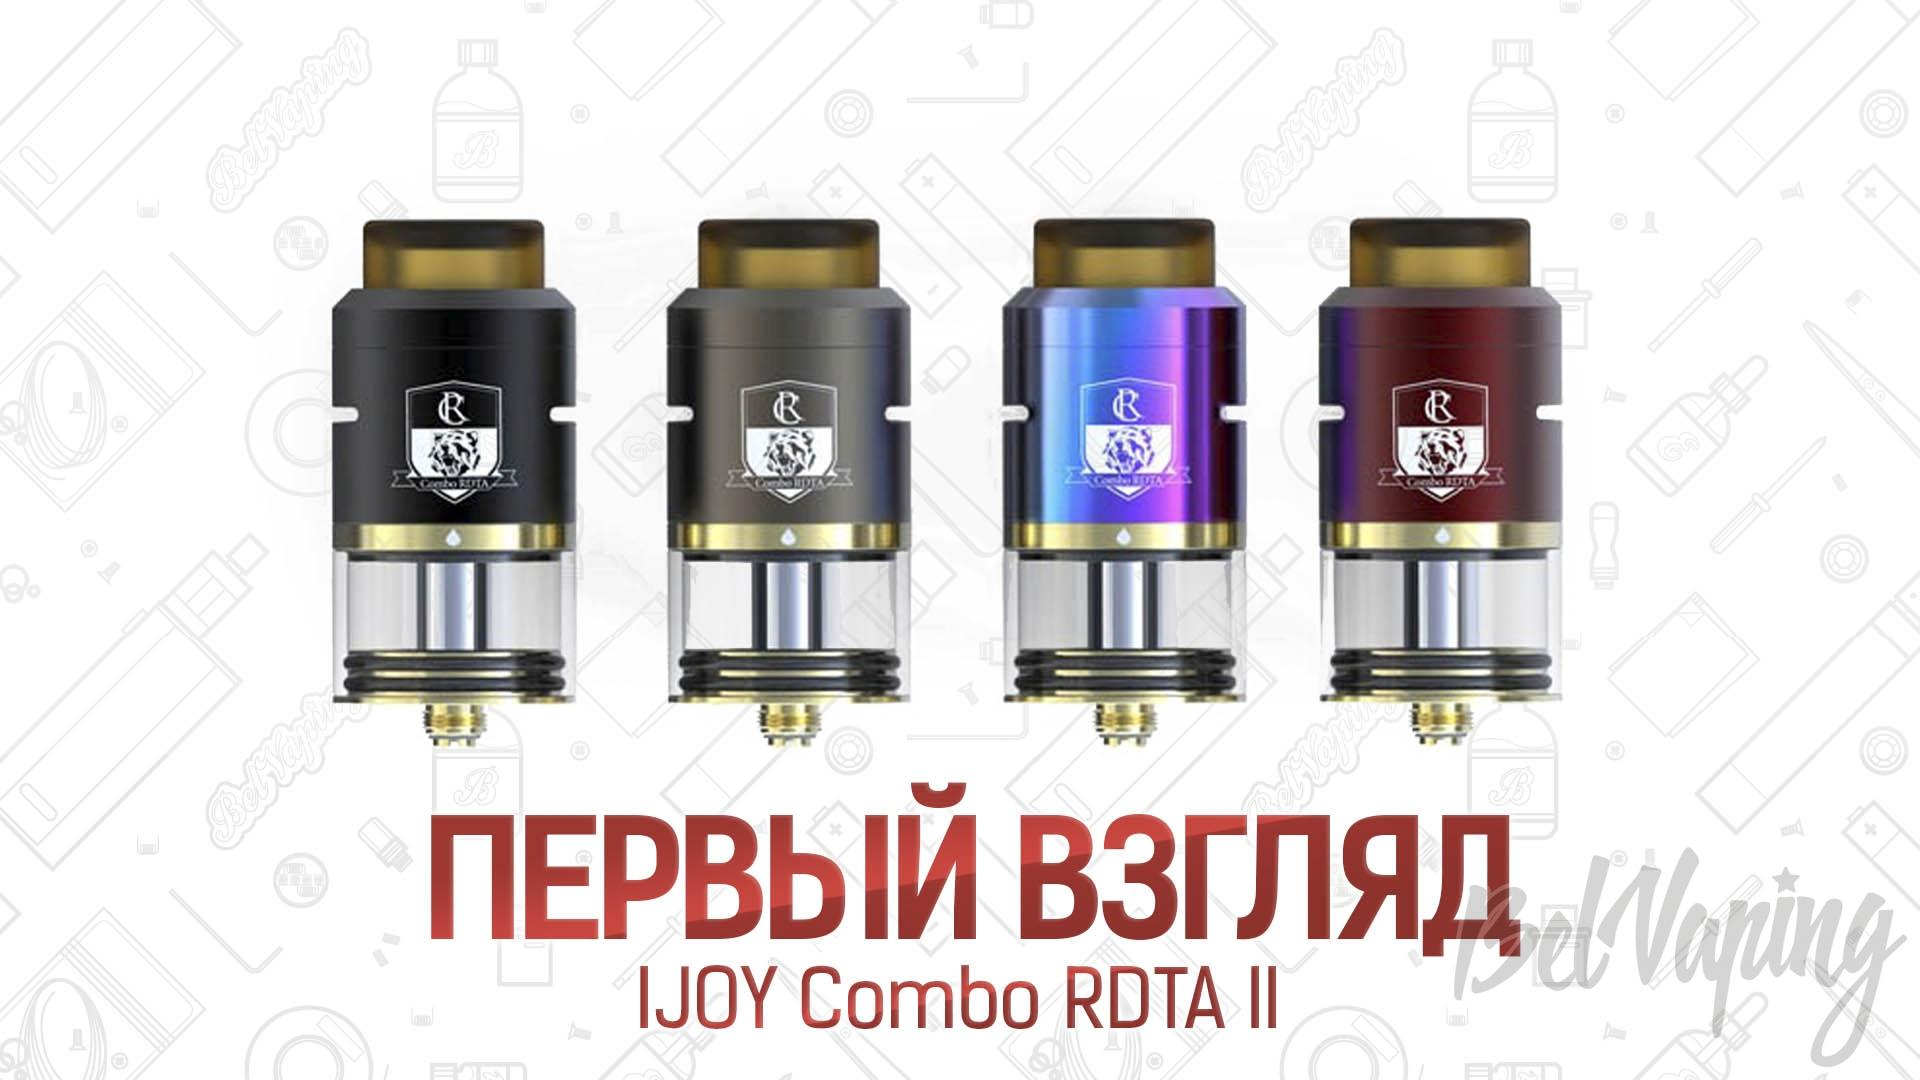 IJOY Combo RDTA II. Первый взгляд